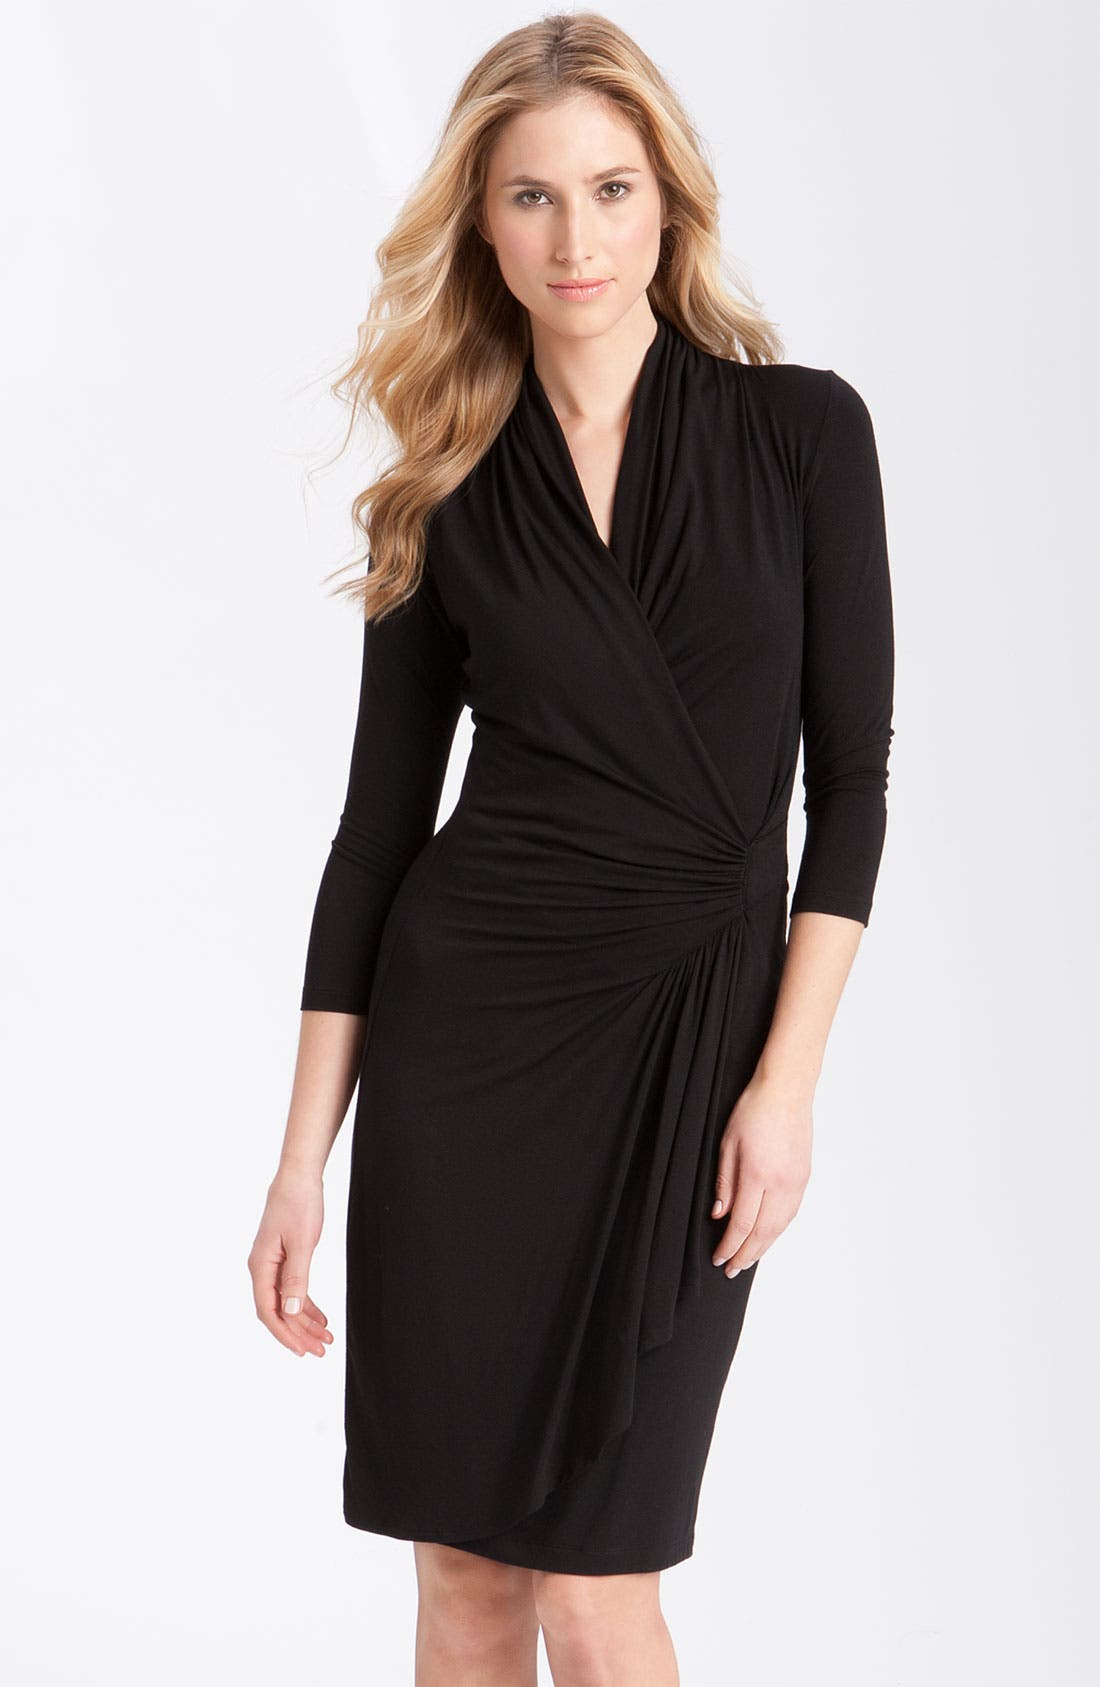 Alternate Image 1 Selected - Karen Kane Cascade Faux Wrap Dress (Regular & Petite)